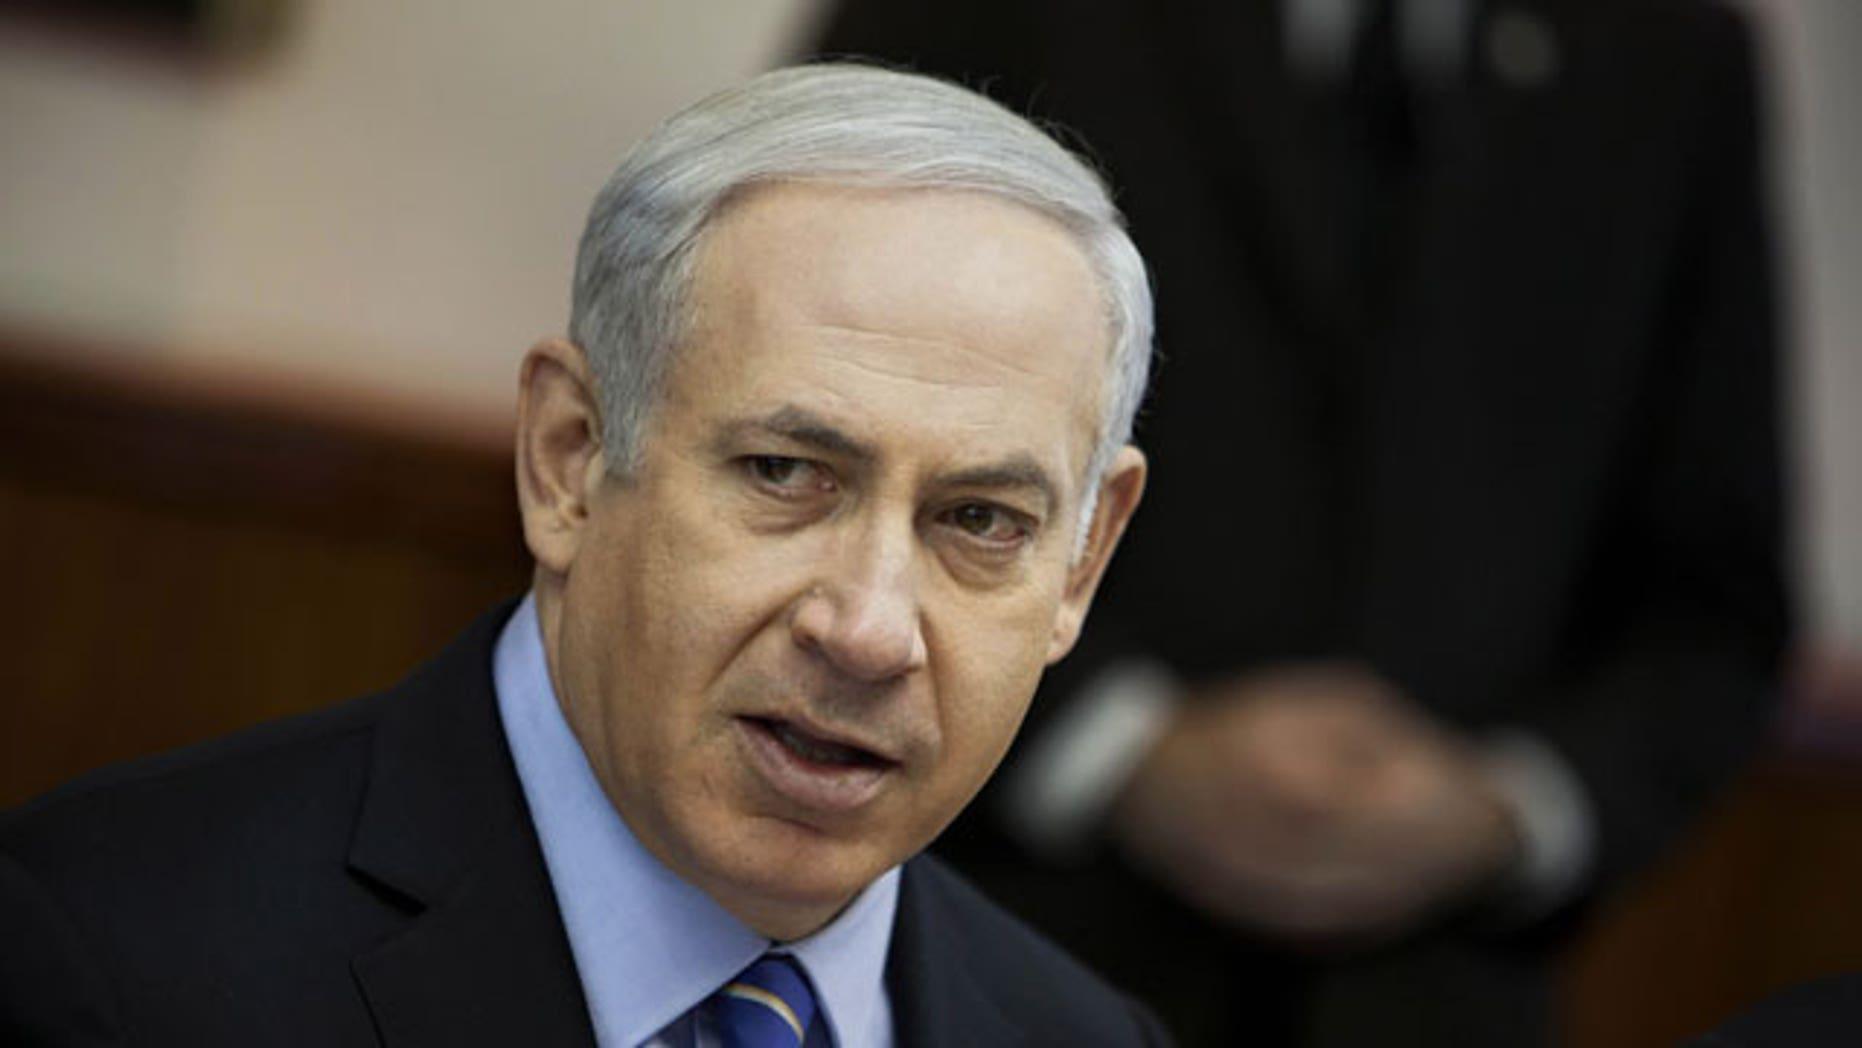 January 15, 2012: Israeli Prime Minister Benjamin Netanyahu attends the weekly cabinet meeting in Jerusalem.